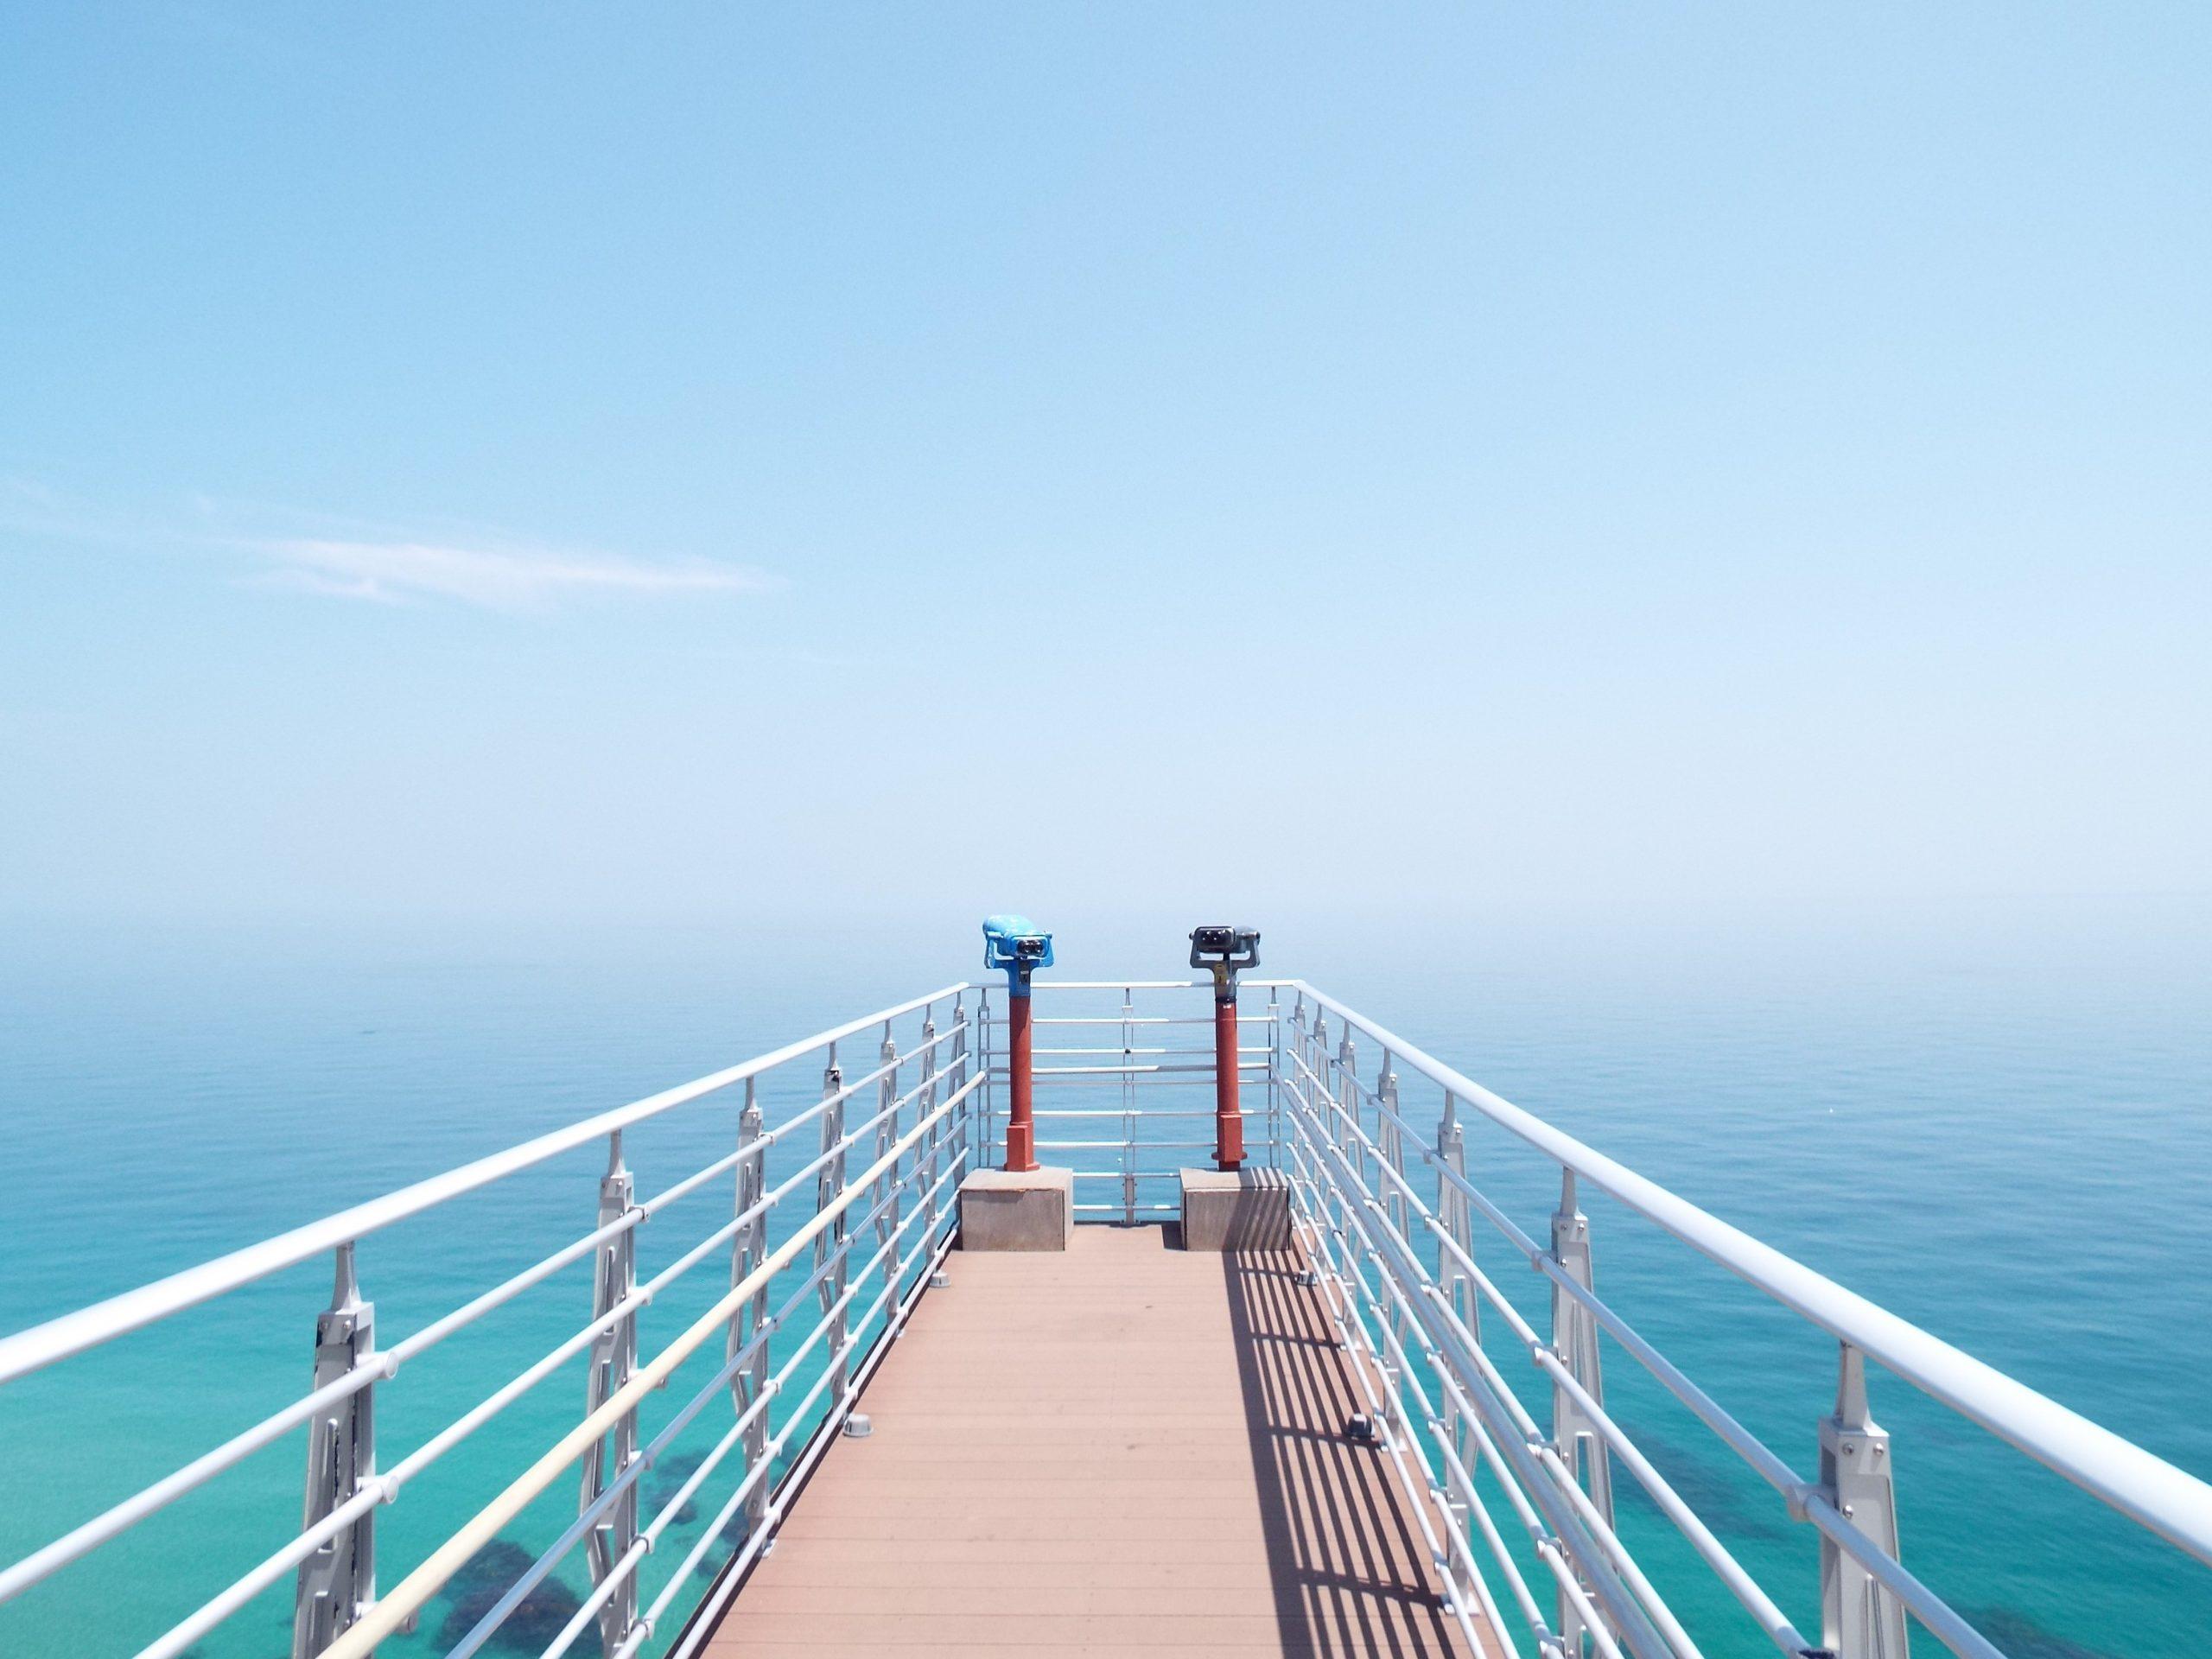 Gangway cruise ship